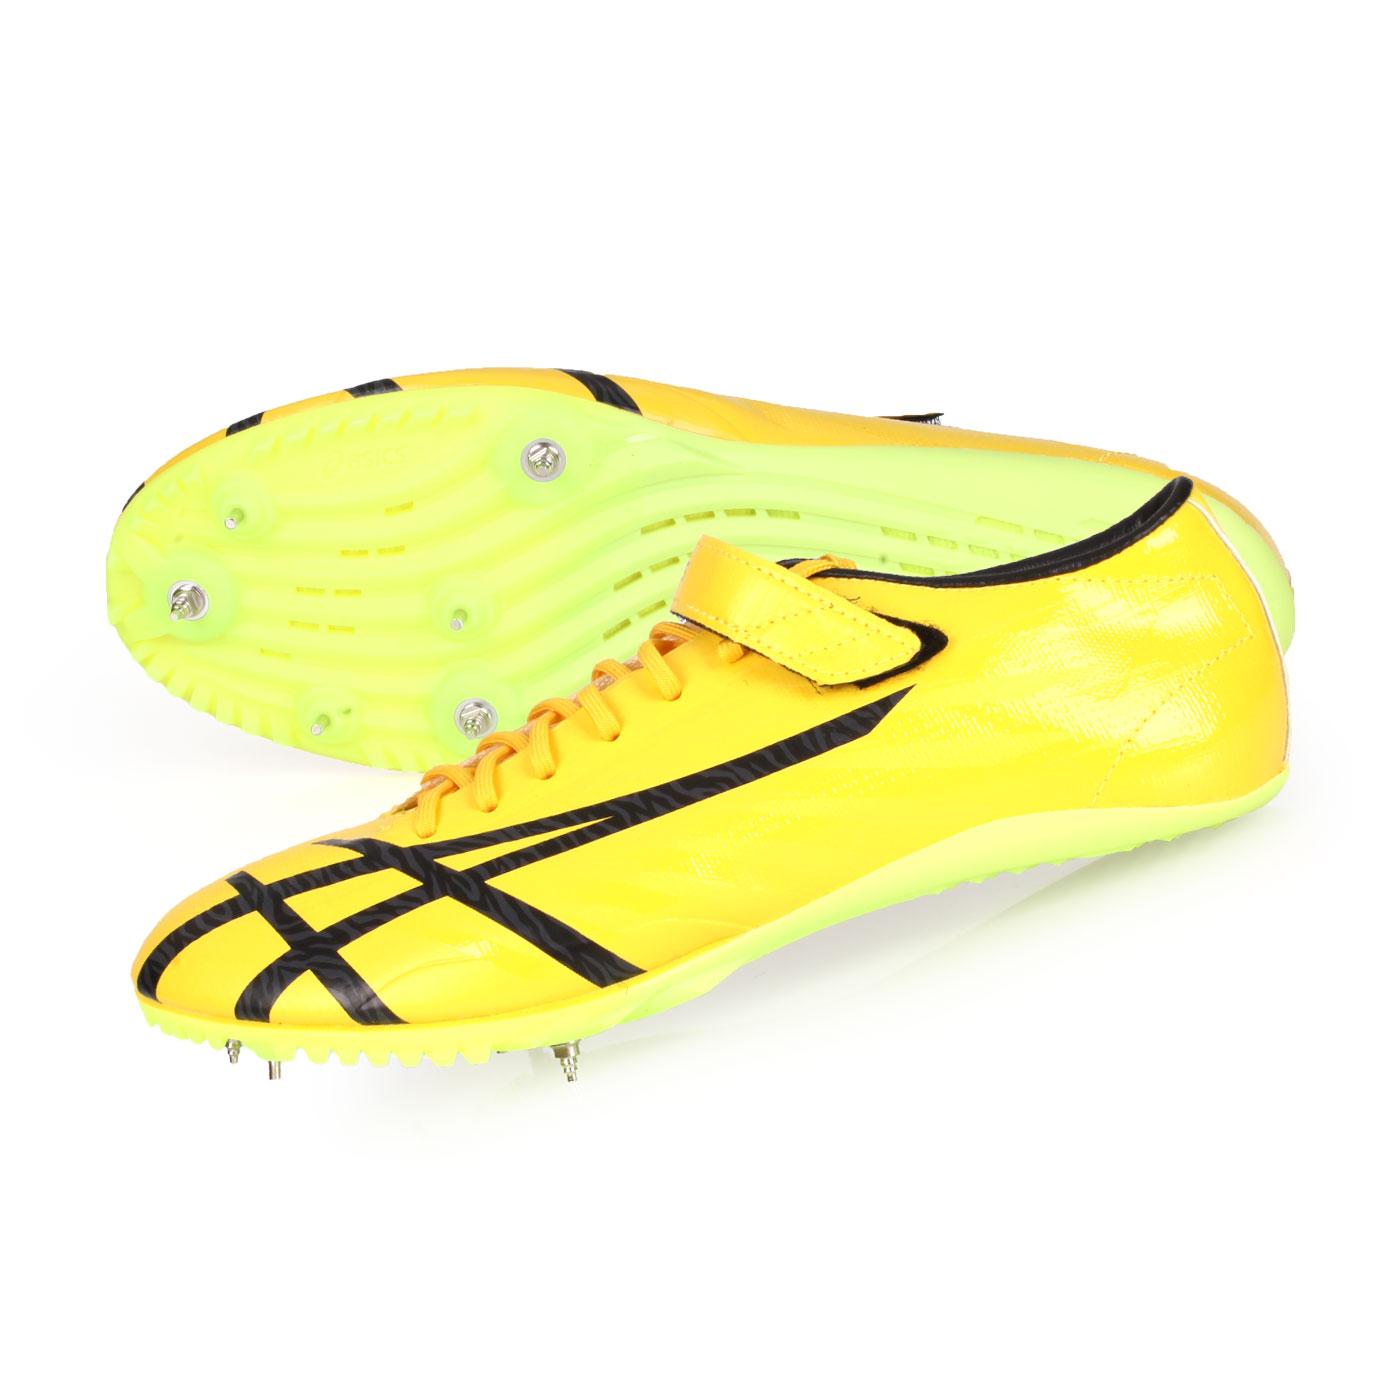 ASICS 田徑釘鞋(短距離)  @JETSPRINT@TTP527-750 - 黃黑